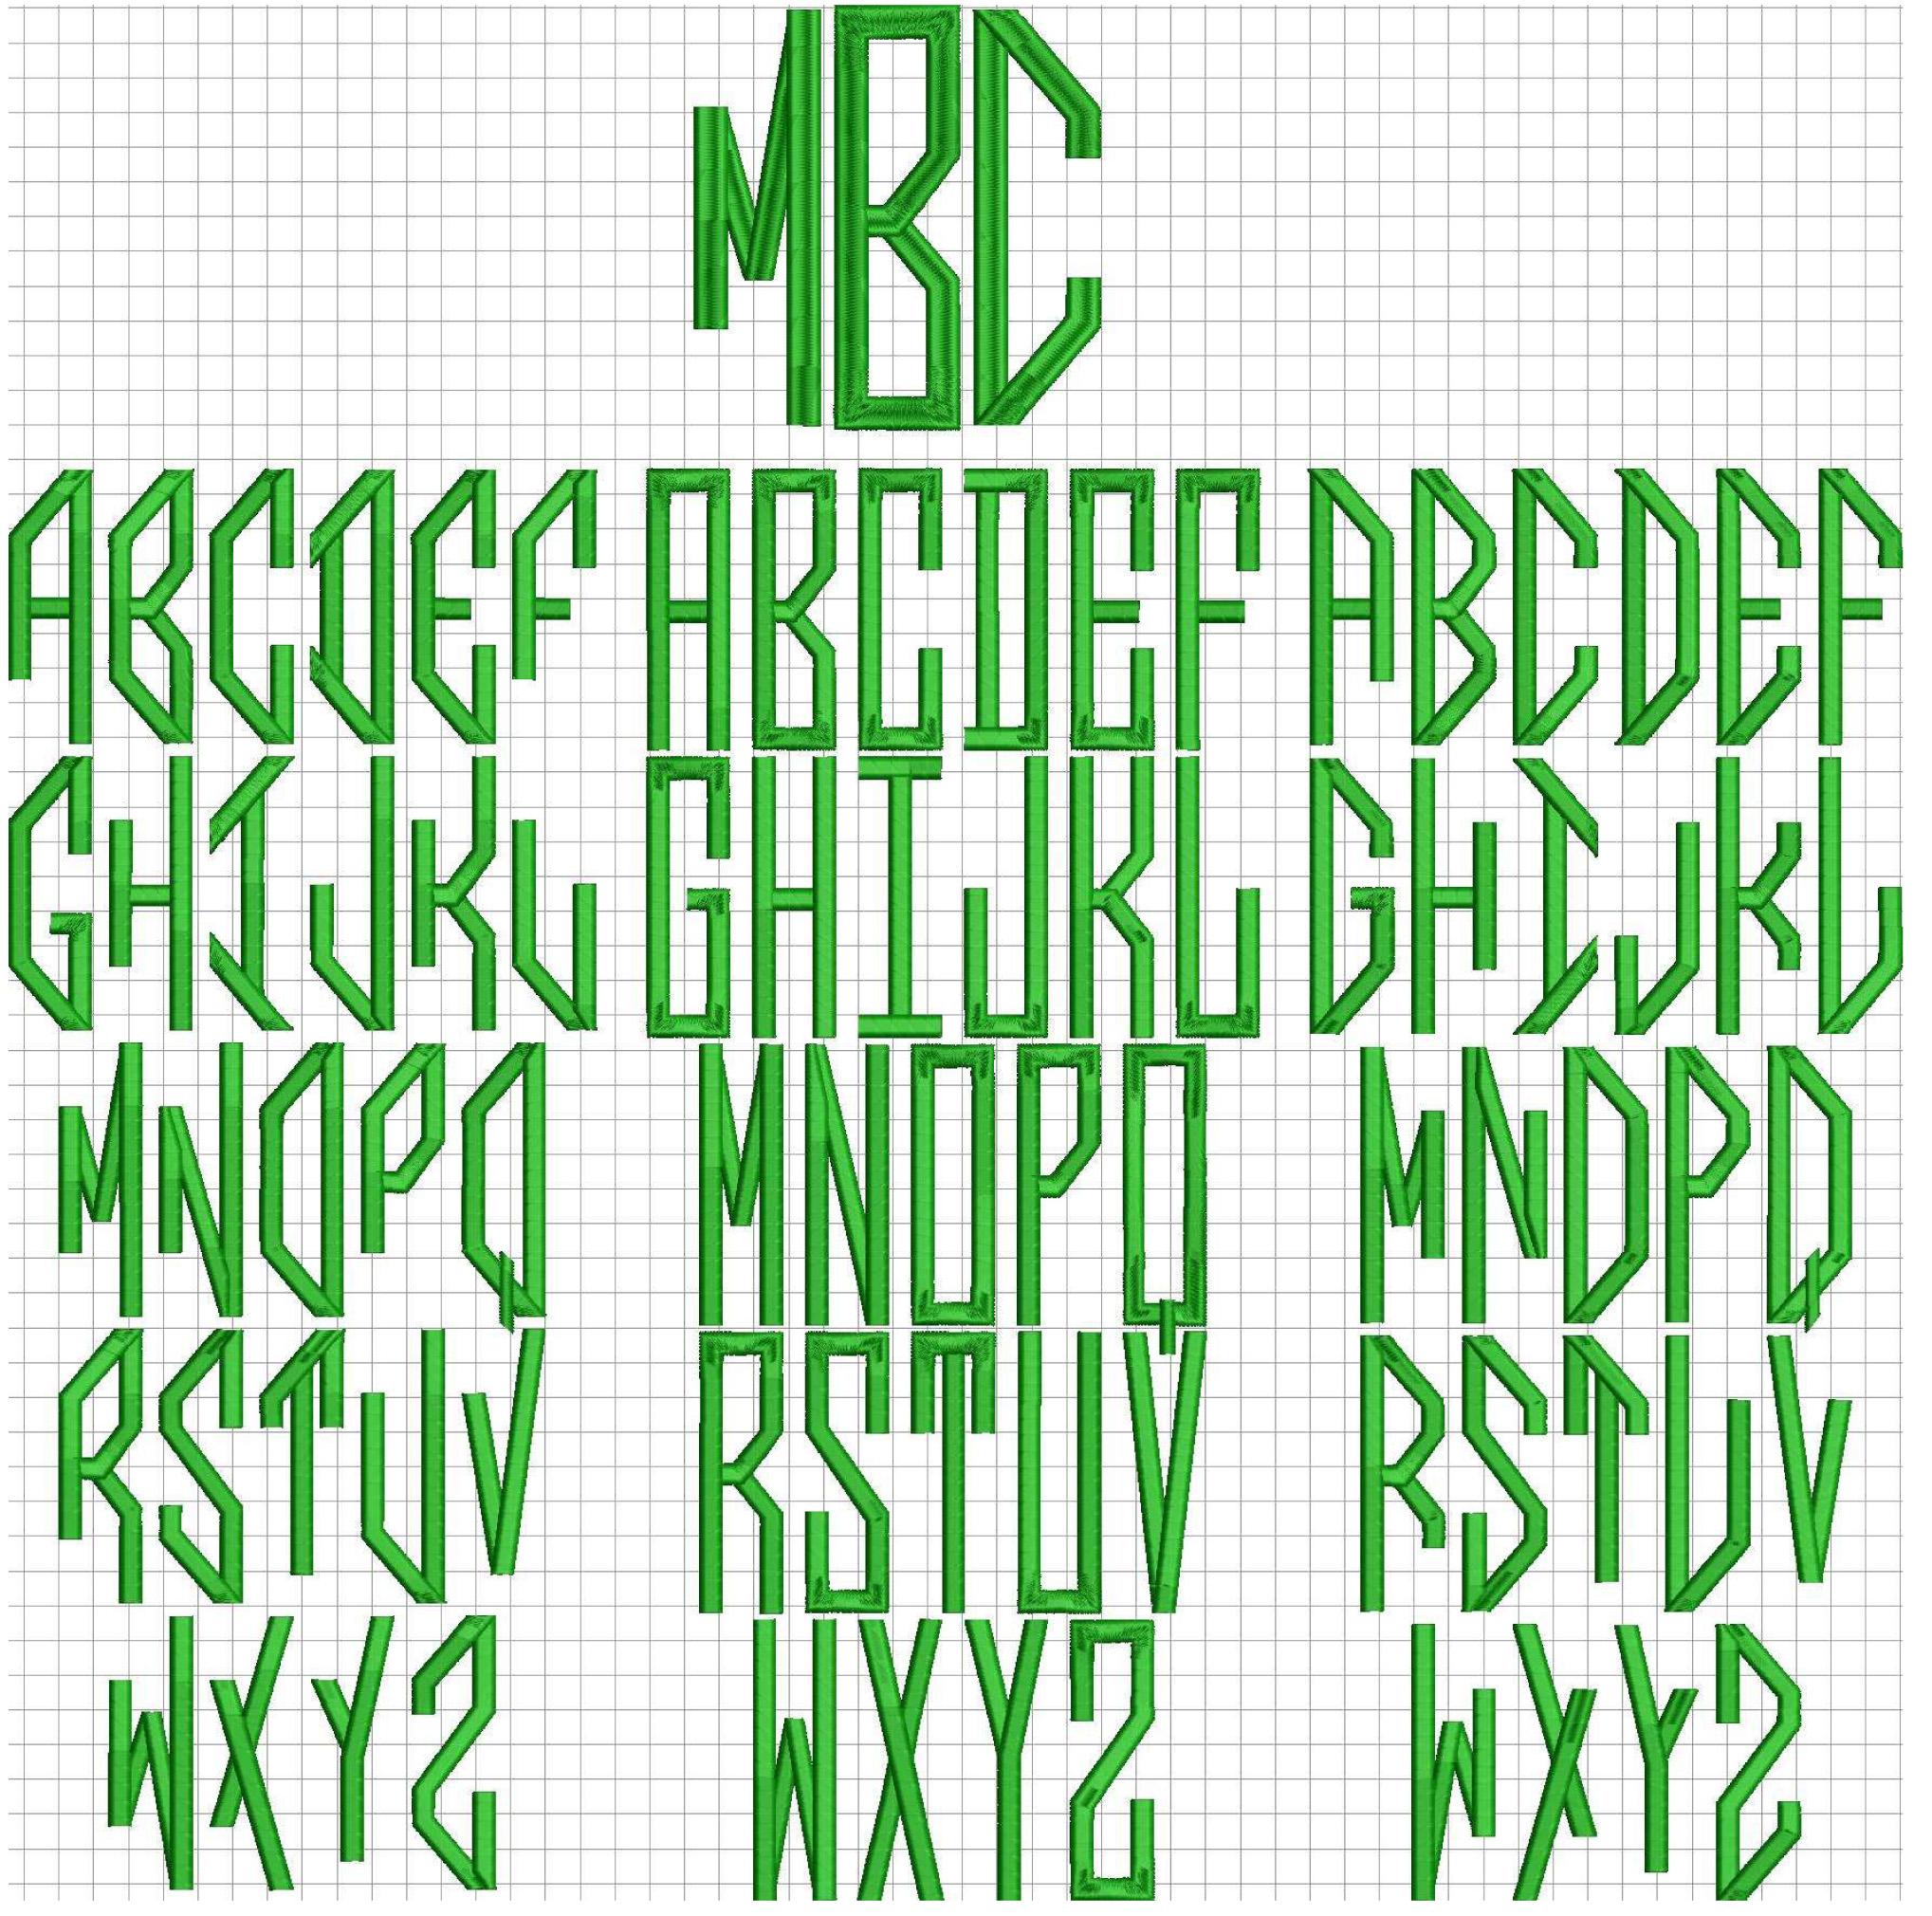 octagonal-monogram.jpg